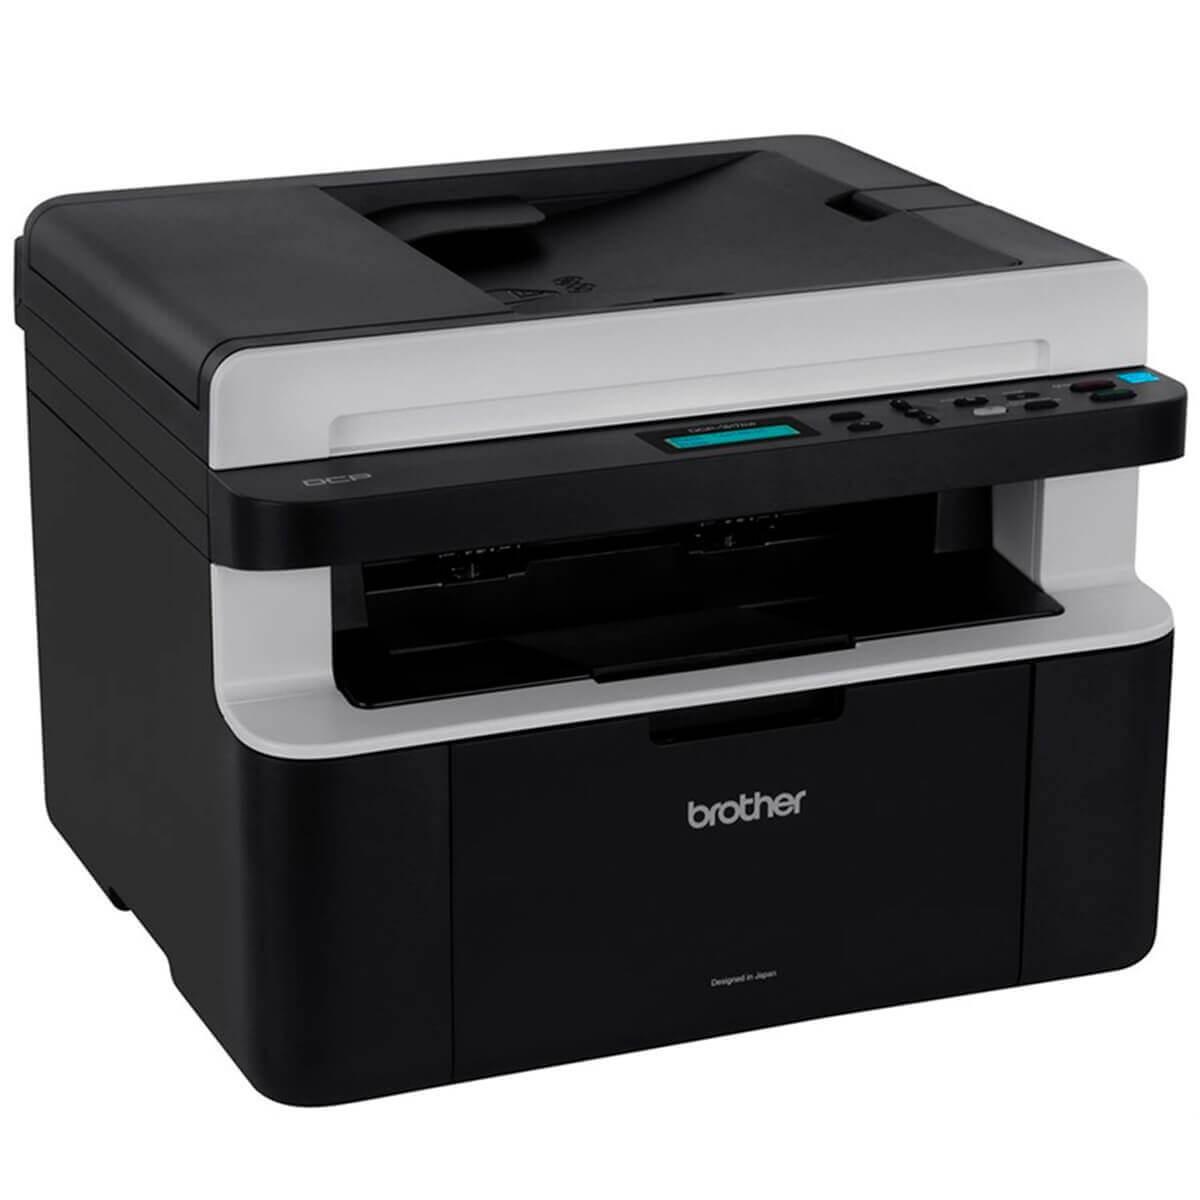 Impressora Multifuncional Brother Dcp 1617 Nw Laser